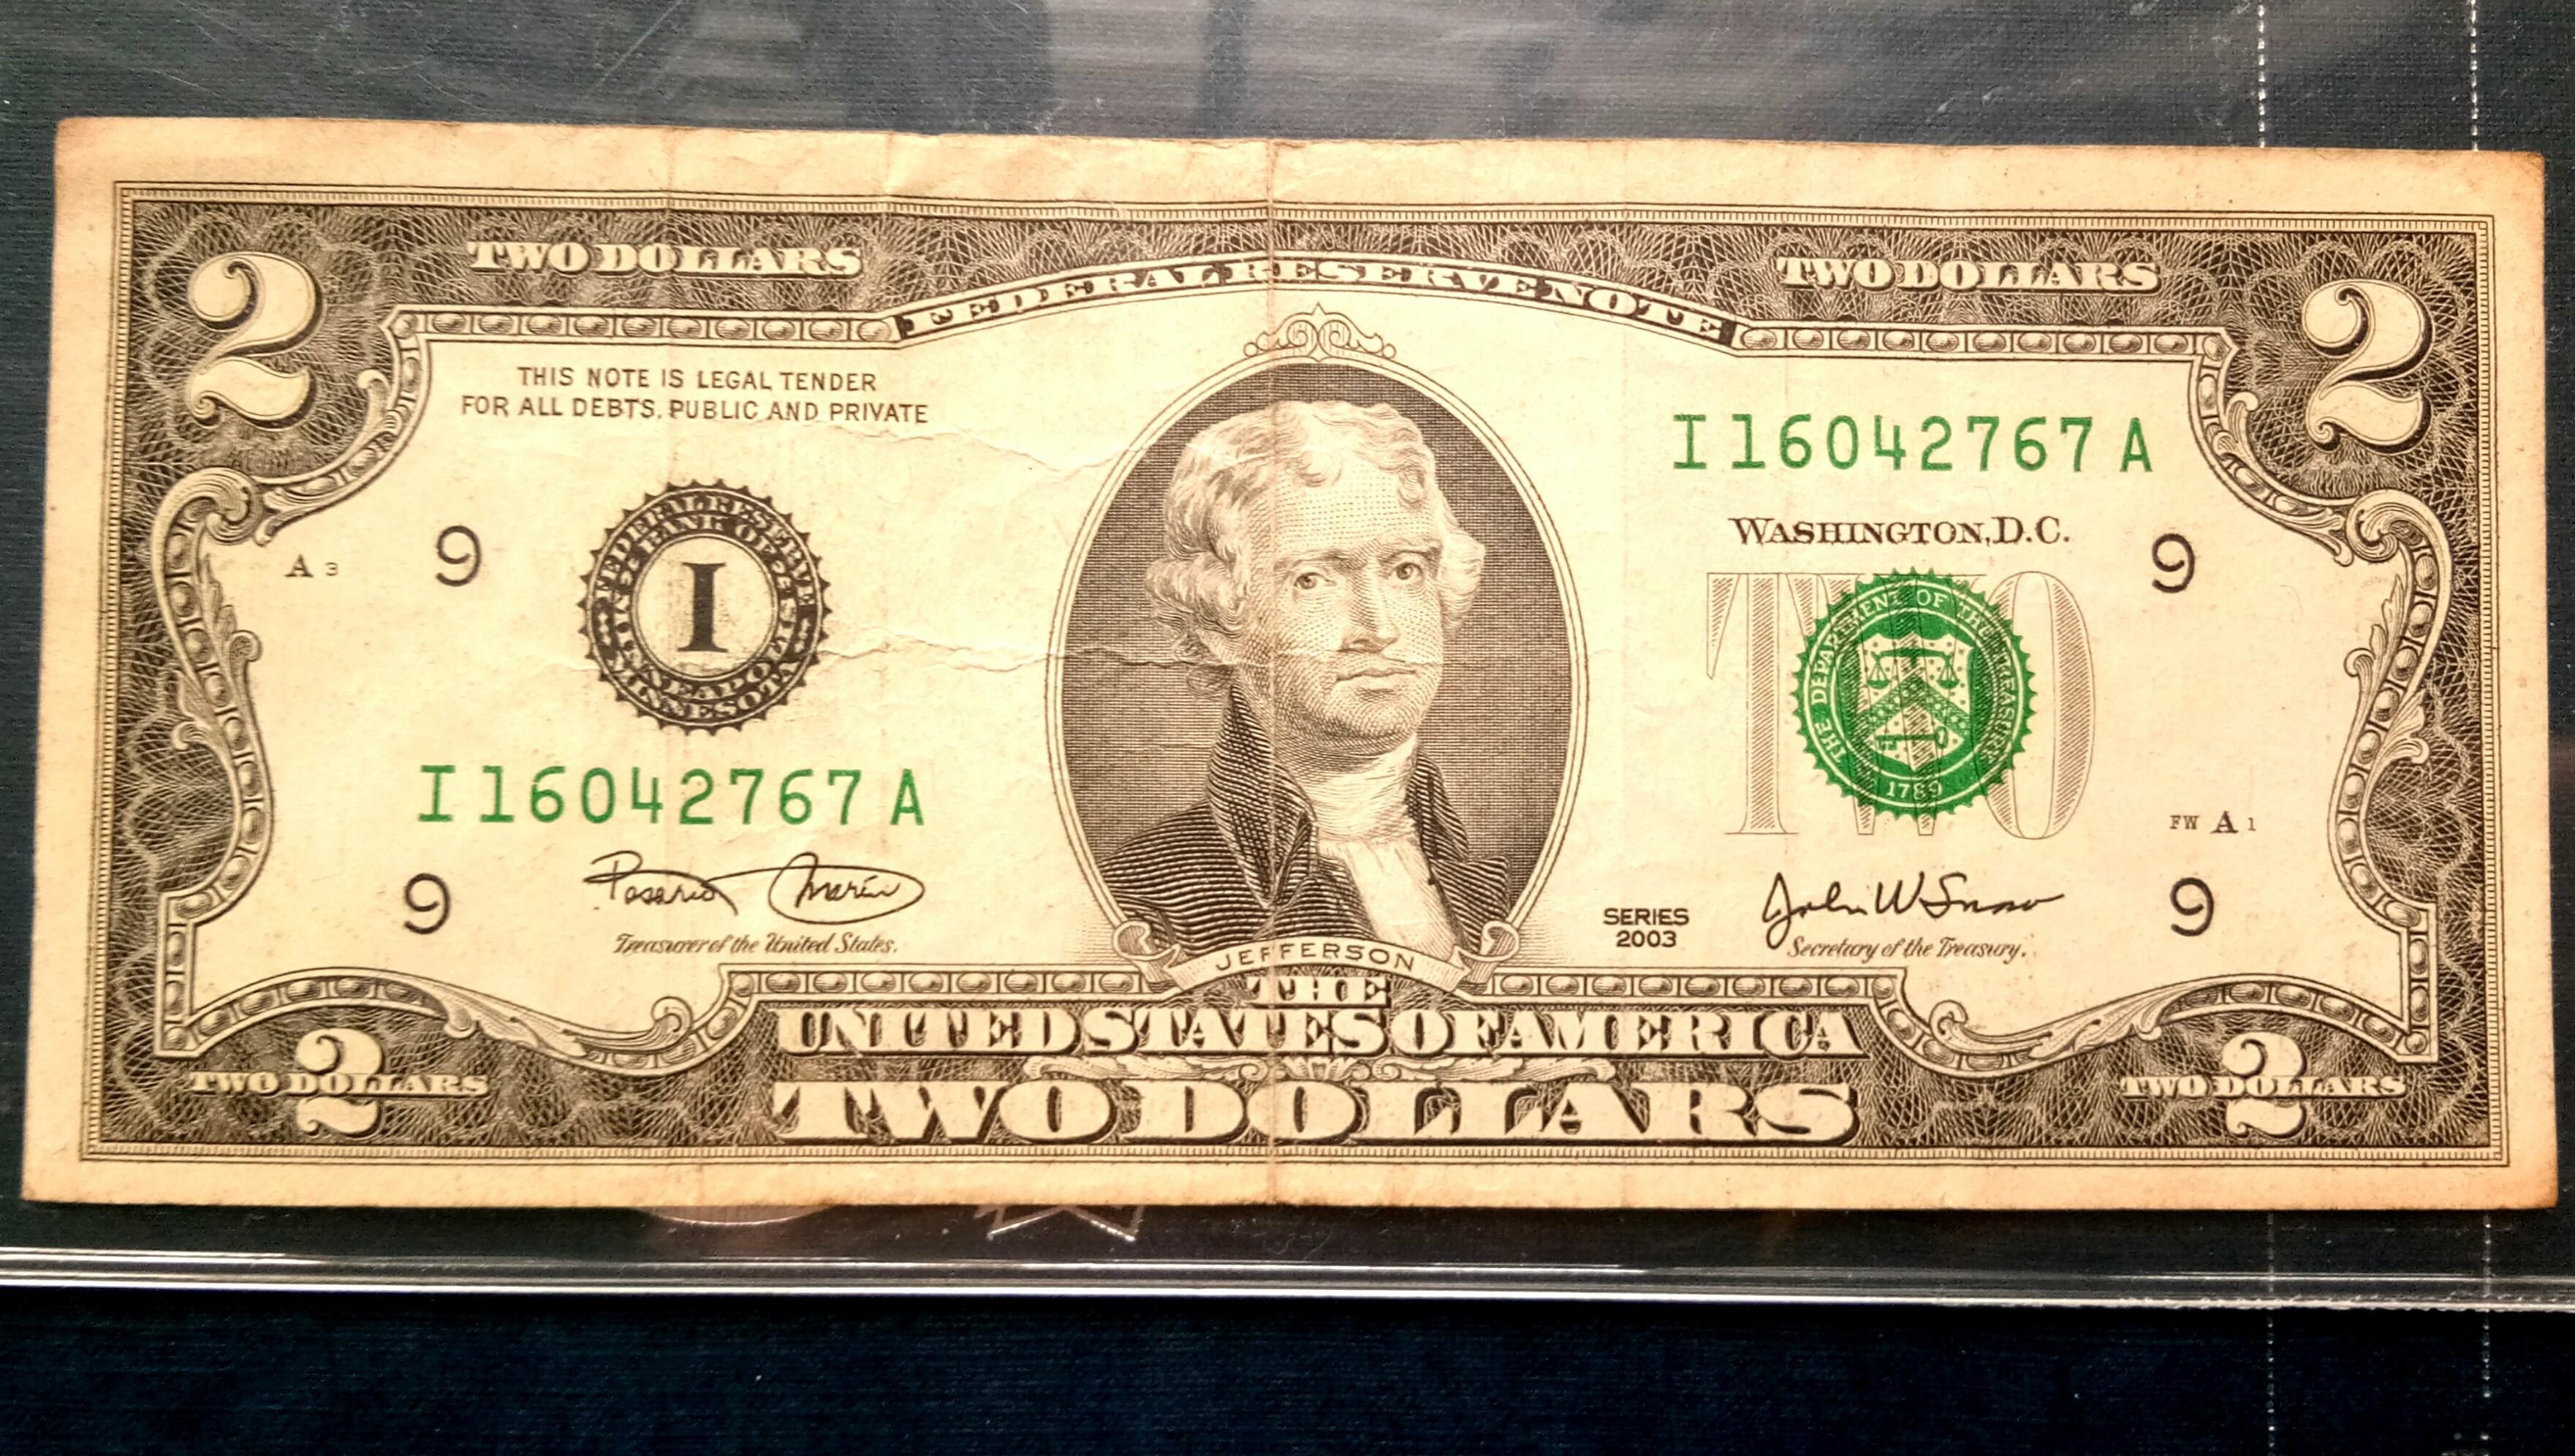 USA Currency 2 Dollar United States of America Banknote Wang Kertas Lama US $ 2